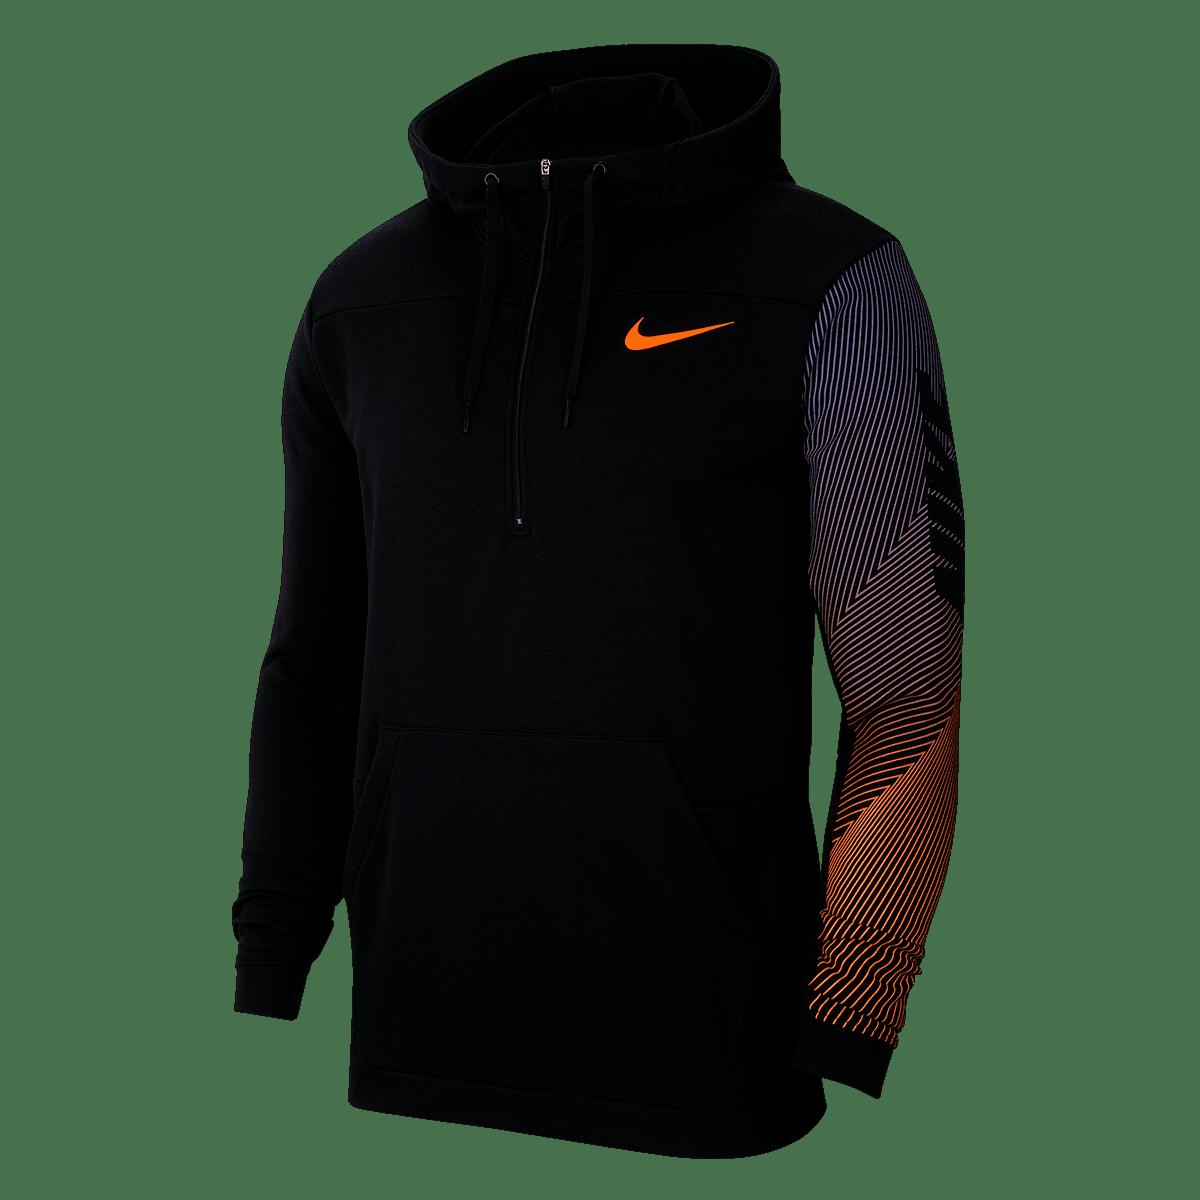 Sweat à capuche Nike Fleece Training Hoody LV 2.0 noirrouge Boutique football